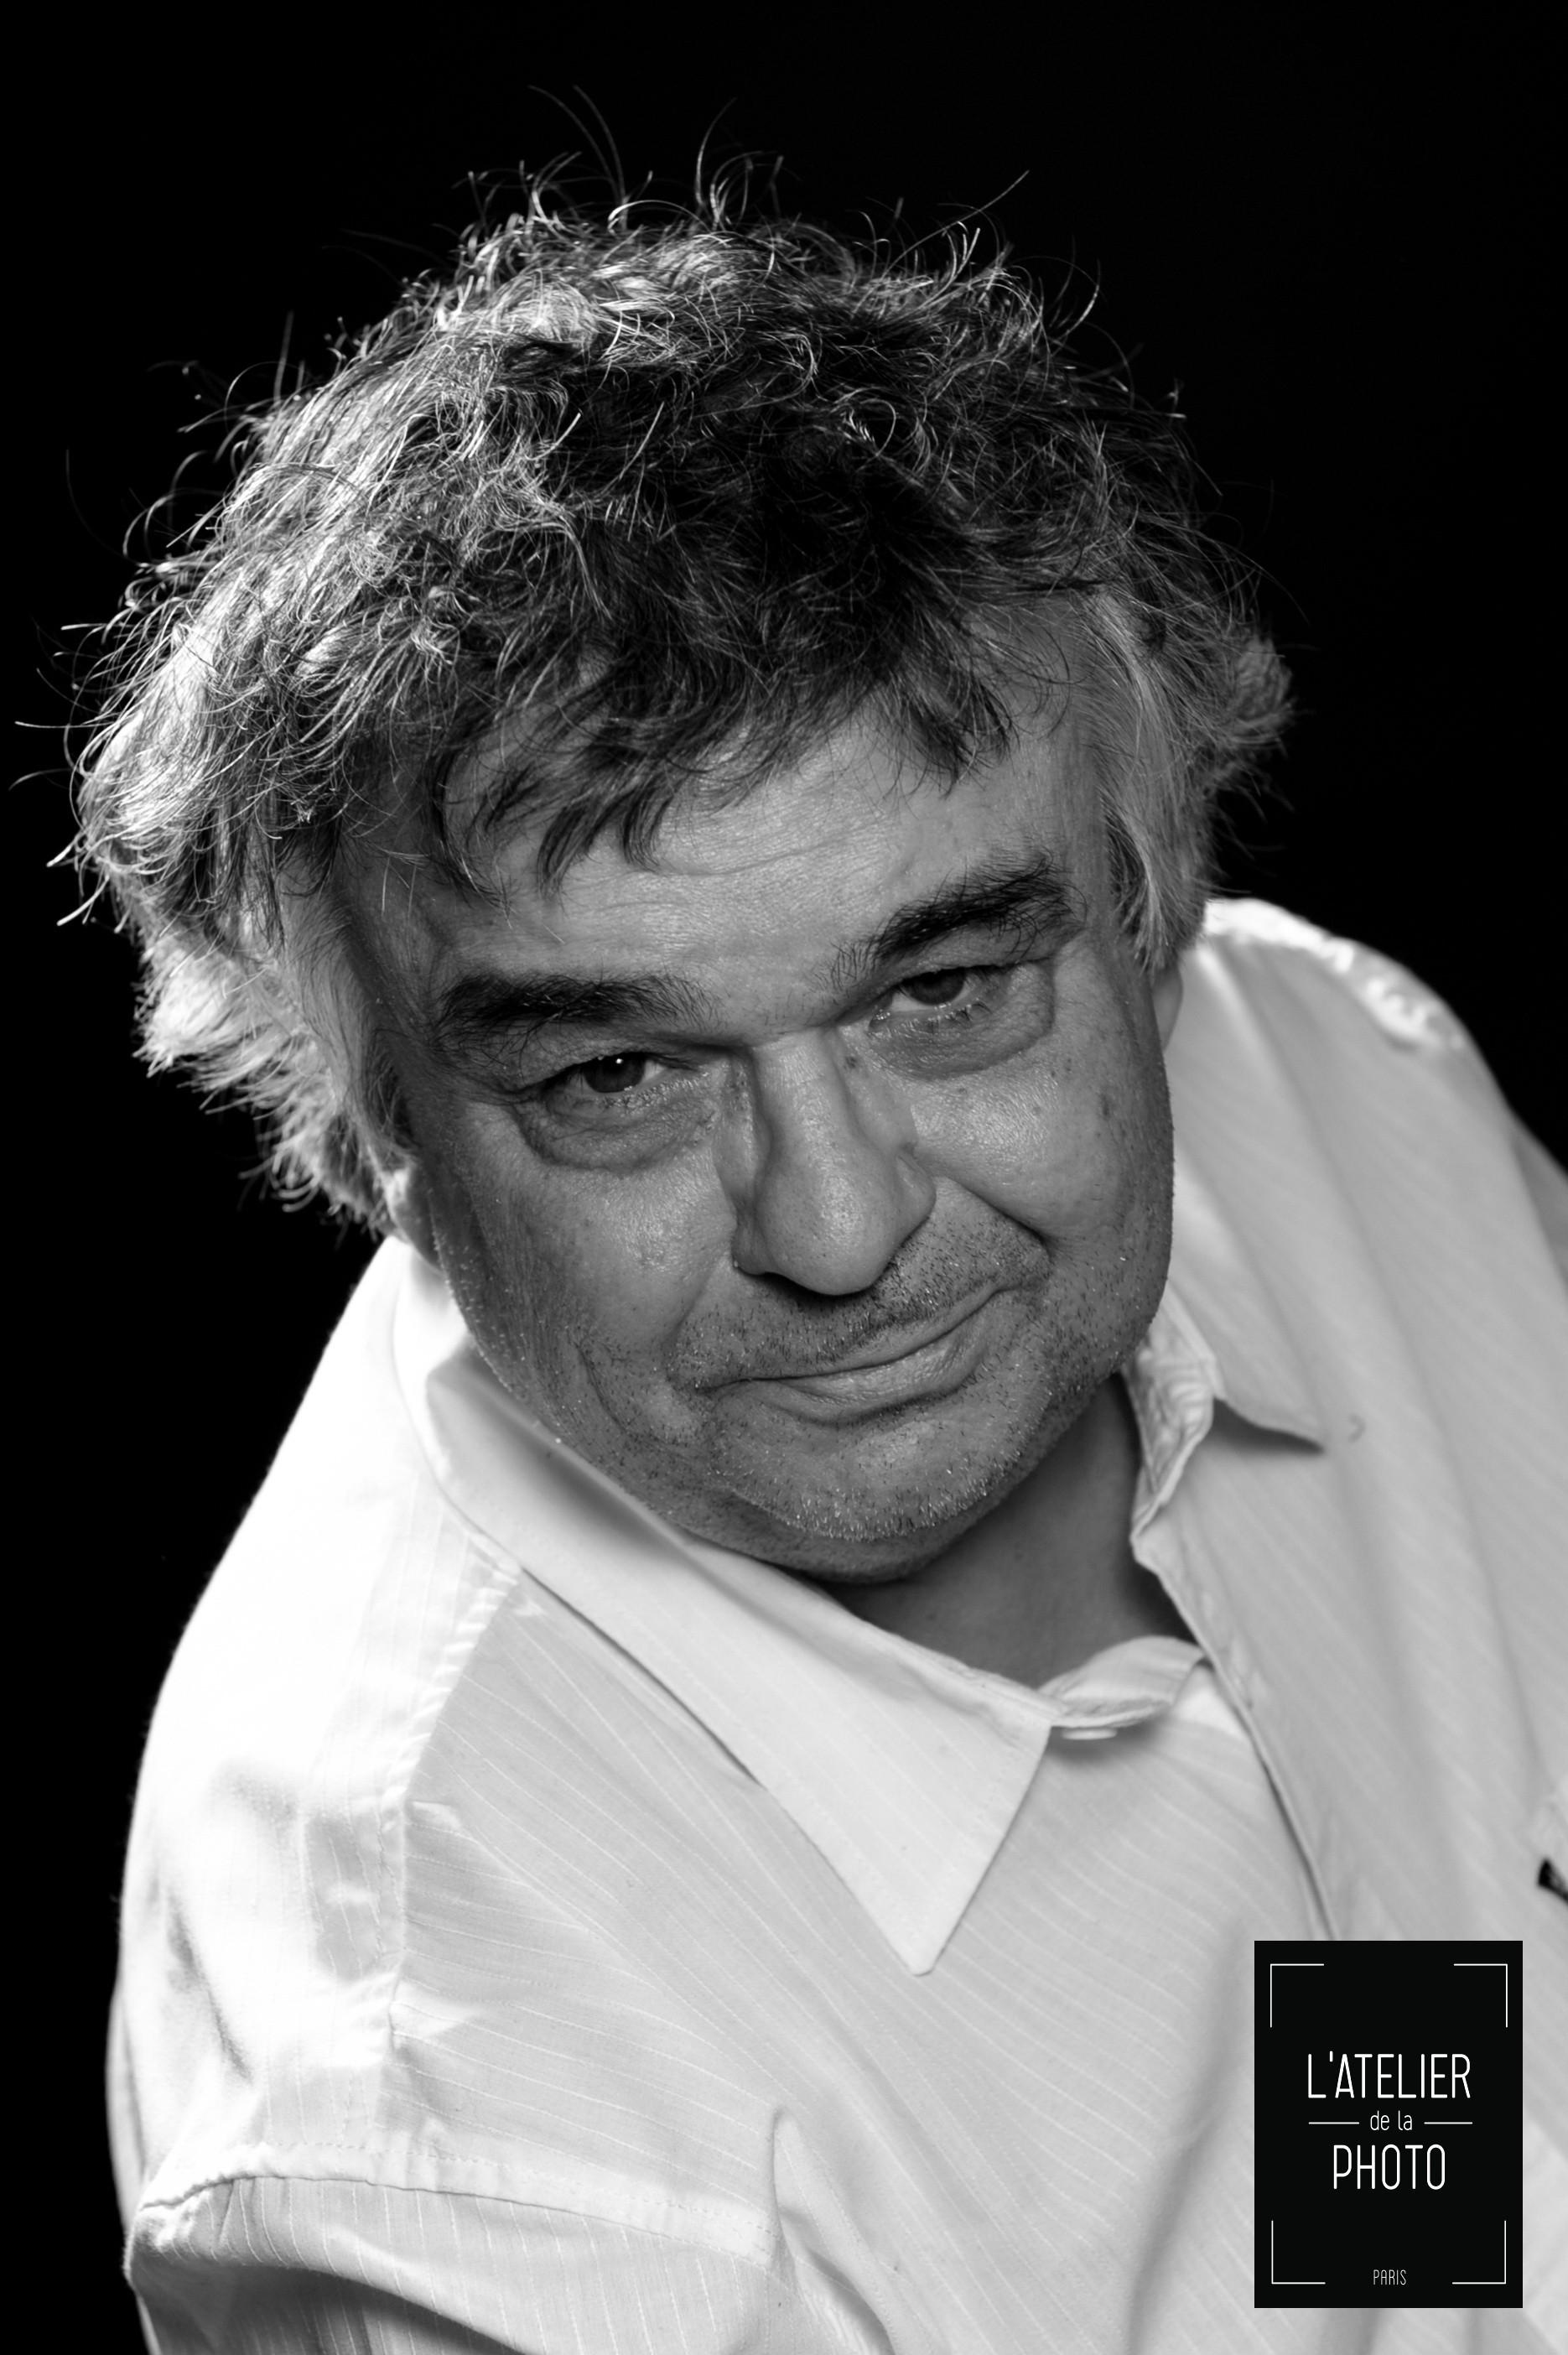 Jean-Claude Barousse